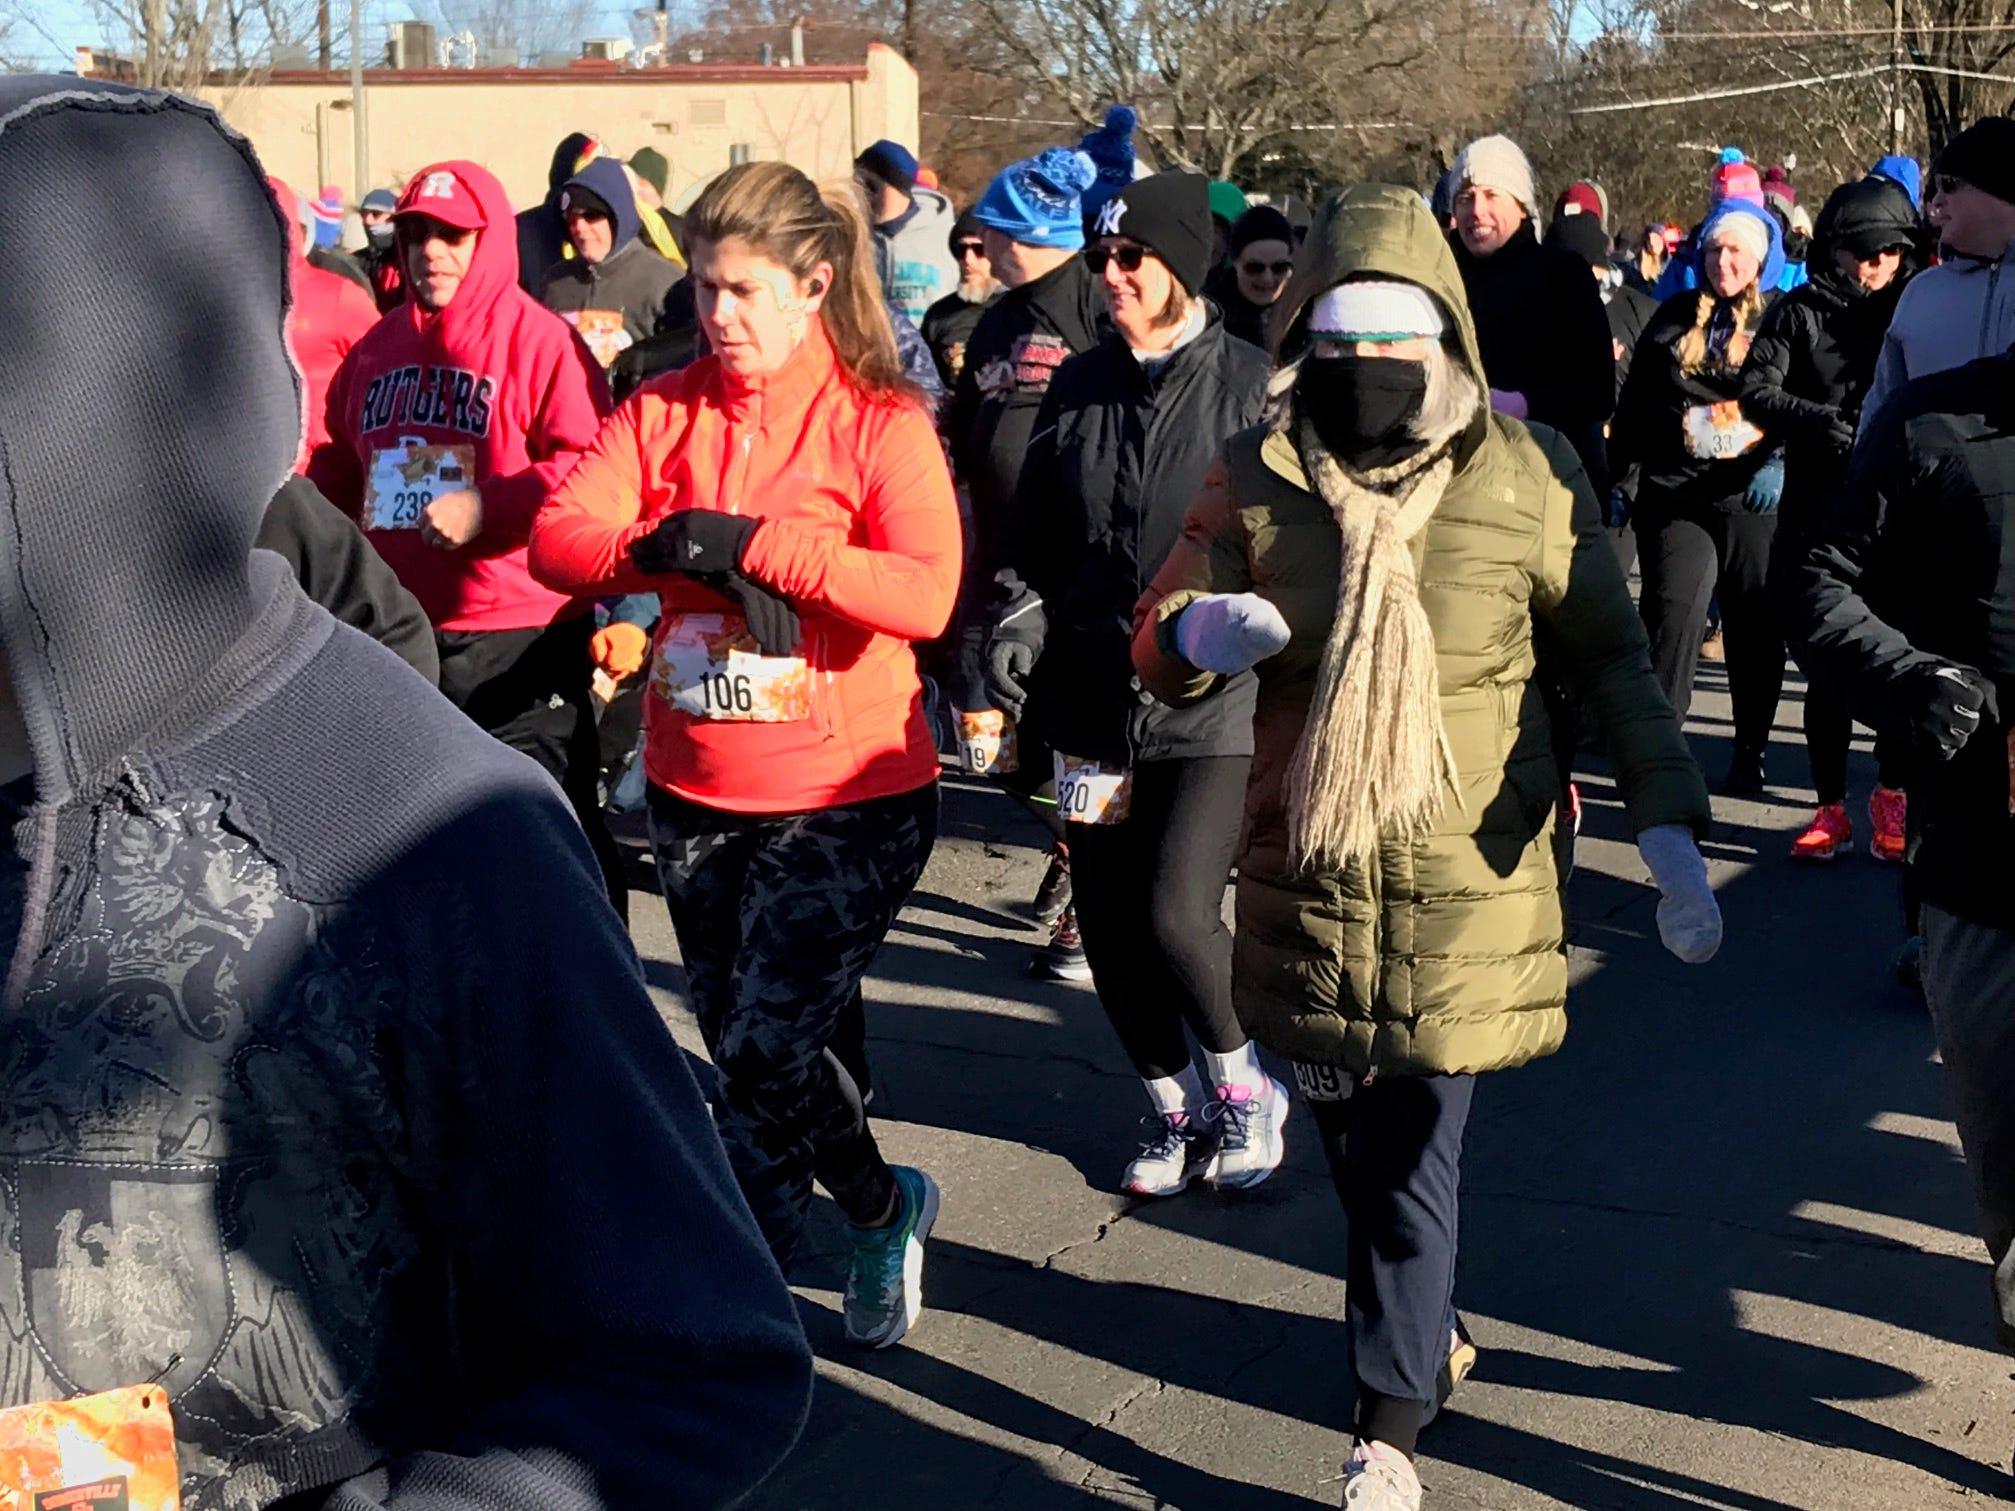 Runners begin the Somerville Turkey Trot on Thanksgiving Day.